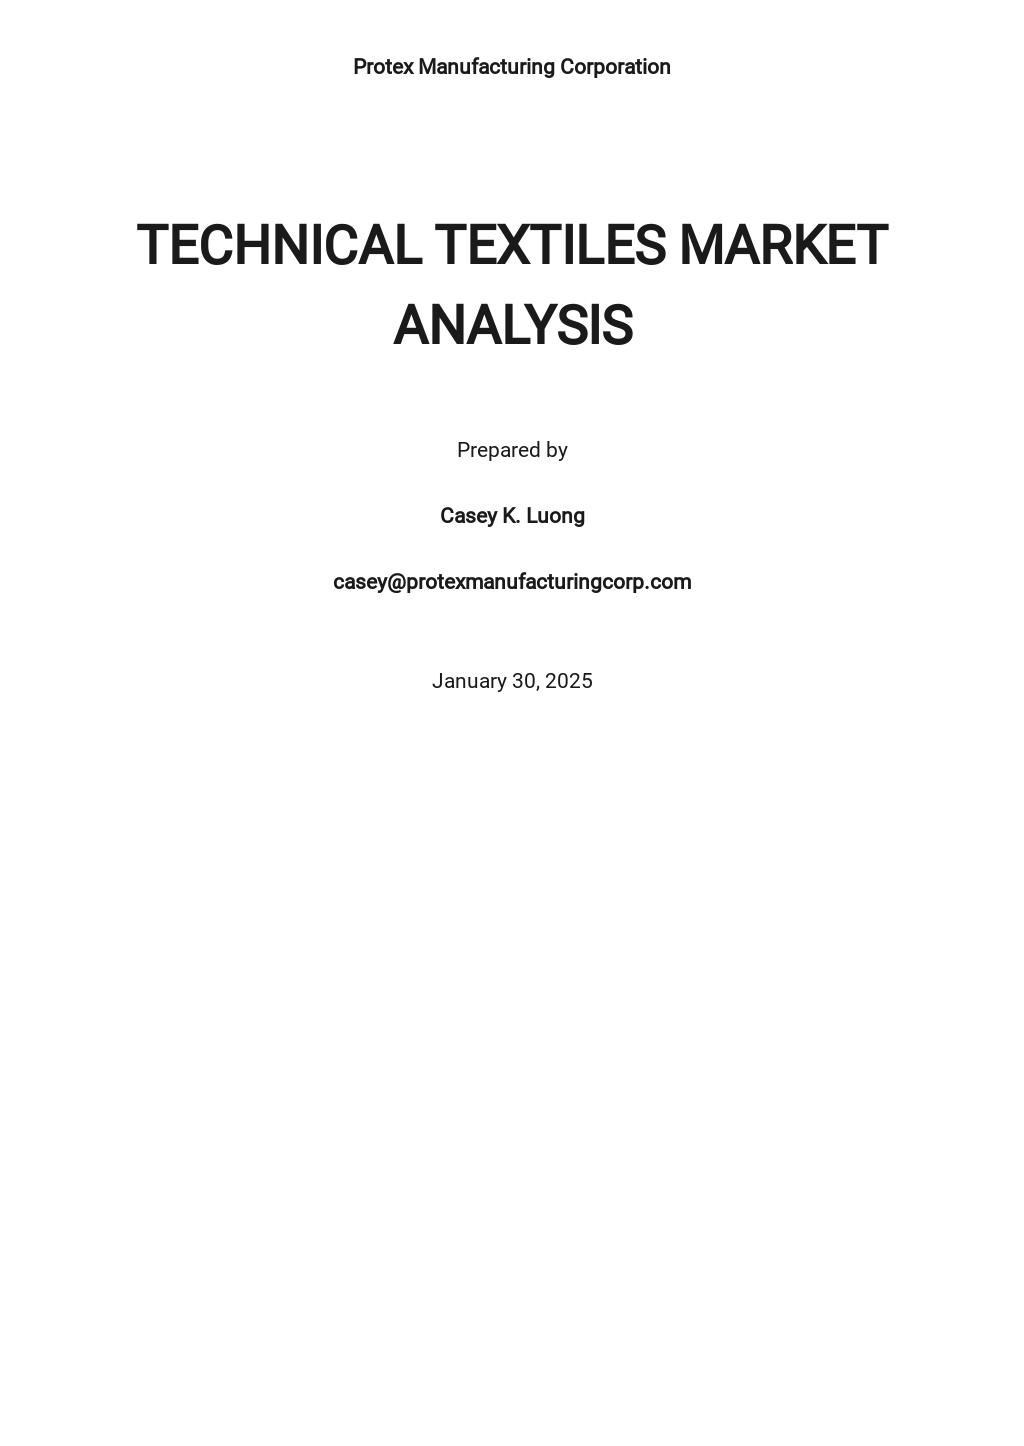 Technical Textiles Market Analysis Template